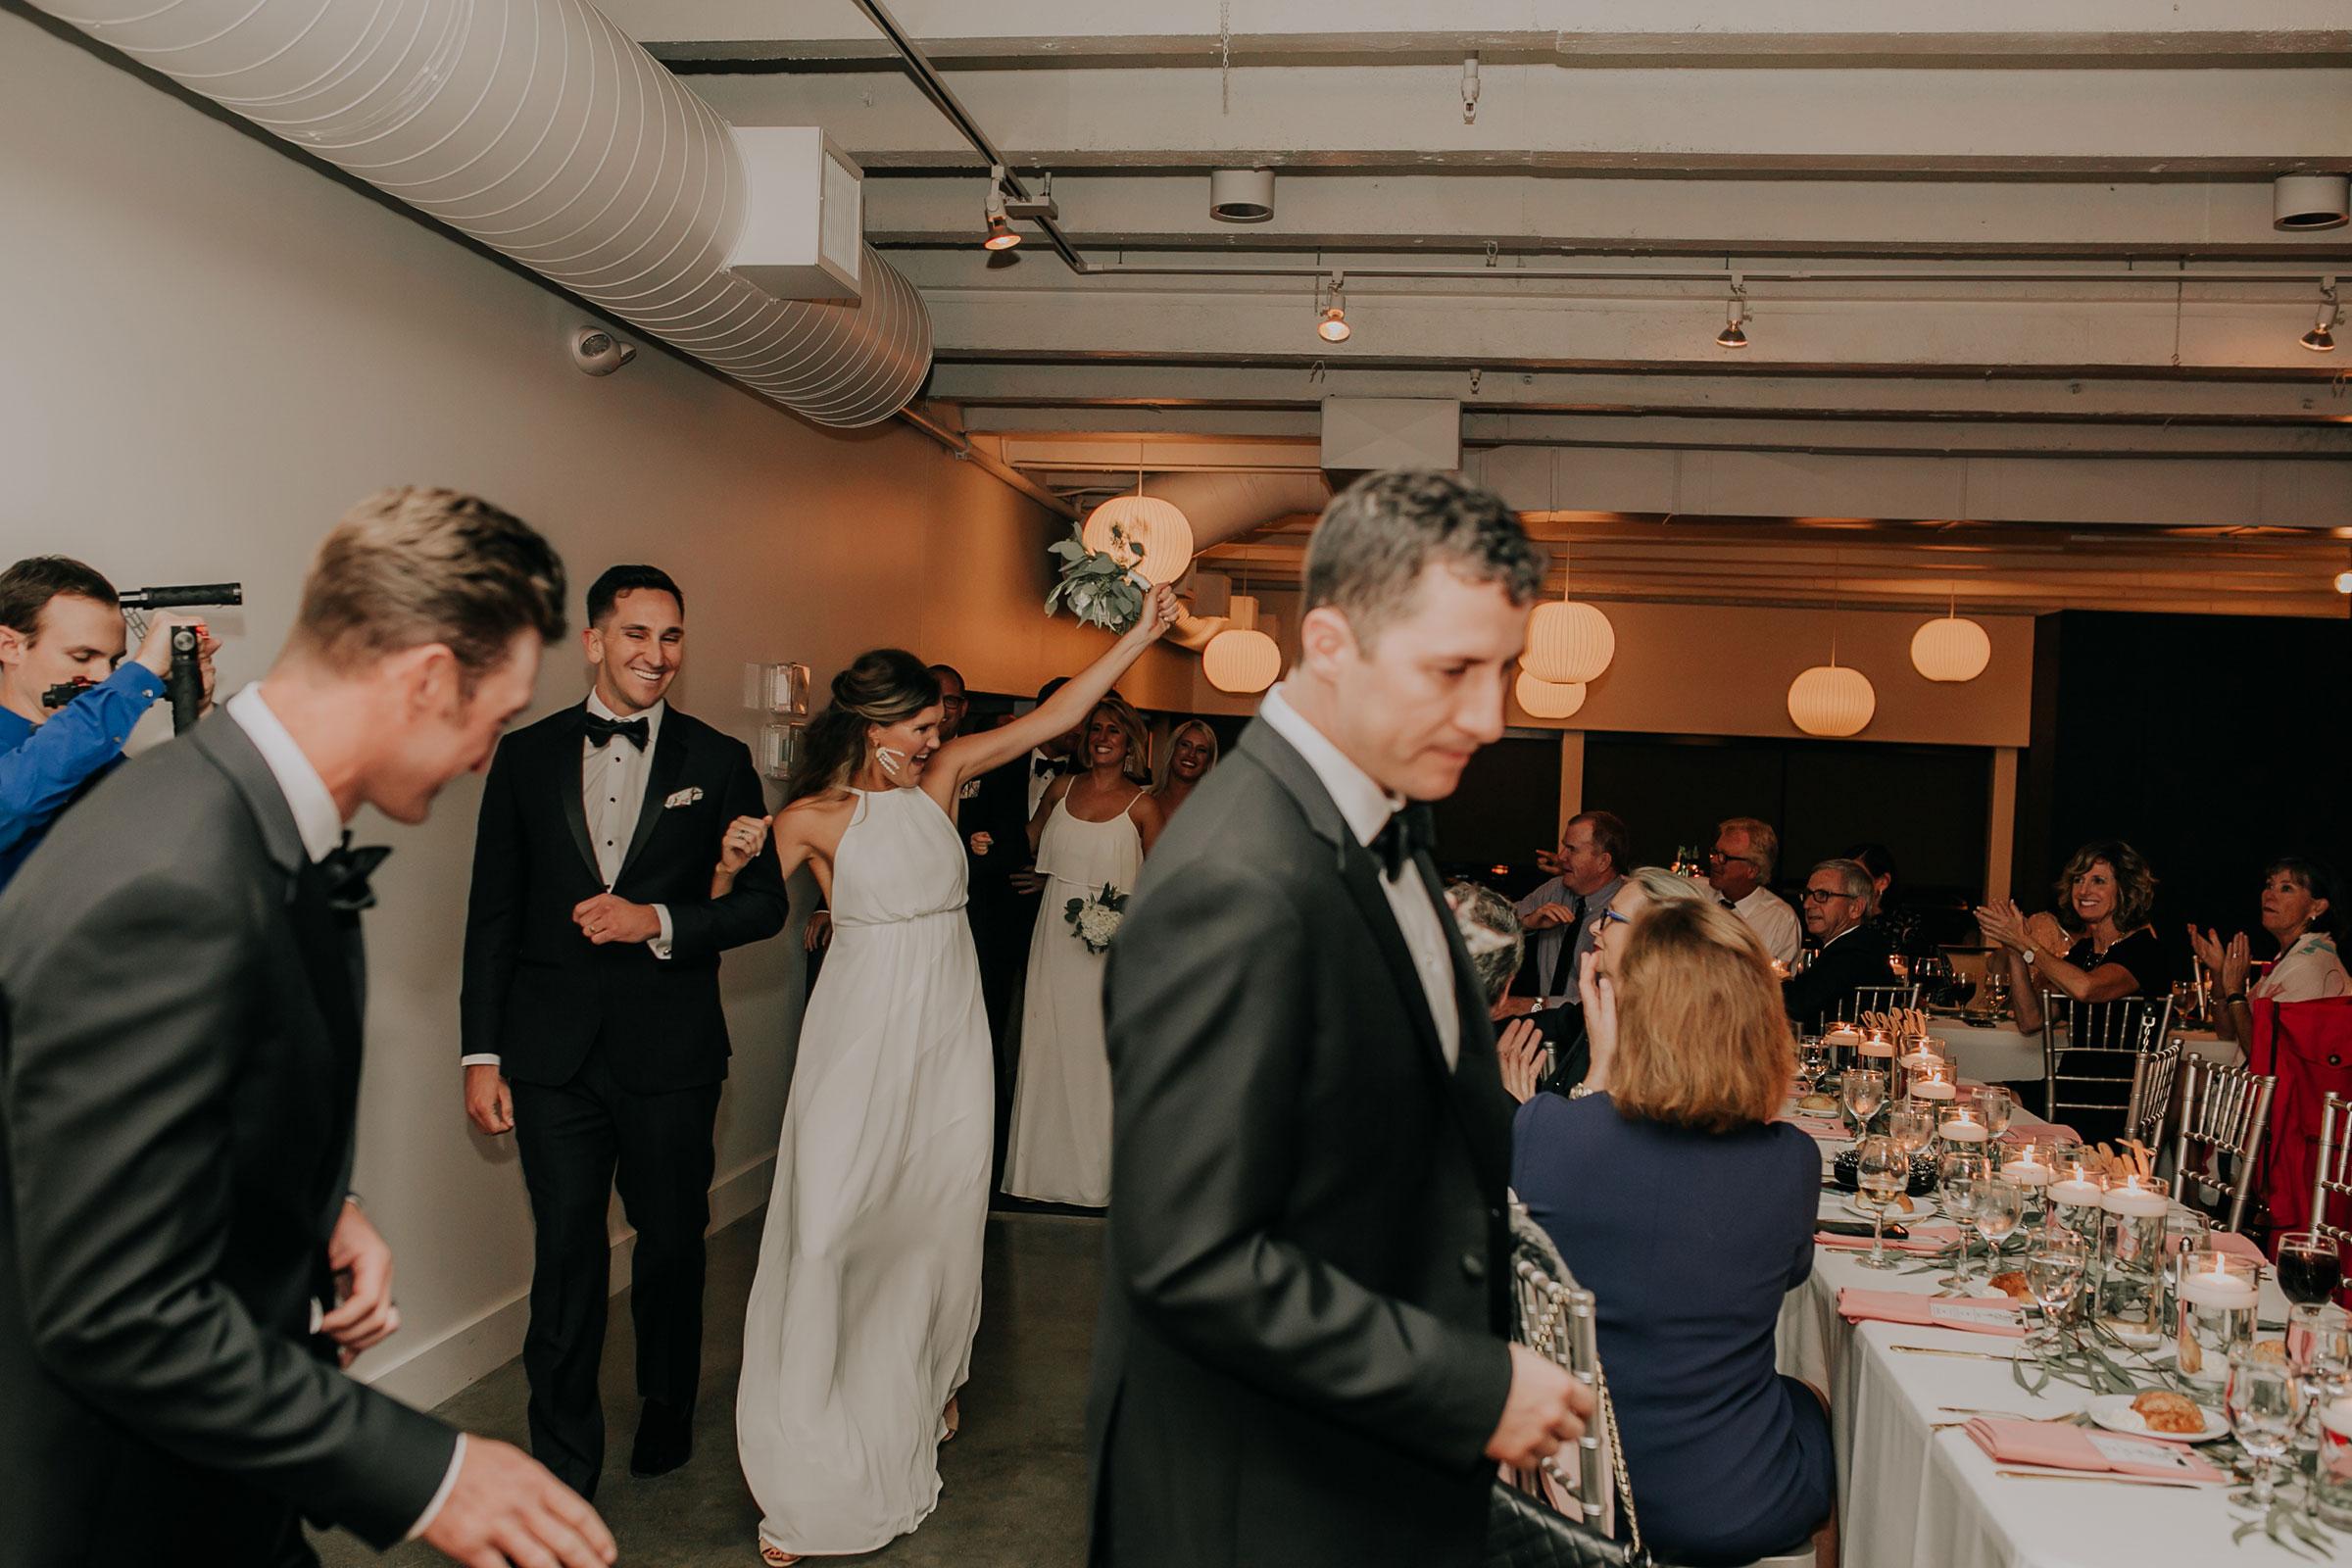 groomsmen-bridesmaid-grand-enterance-founders-one-nine-omaha-nebraska-raelyn-ramey-photography.jpg